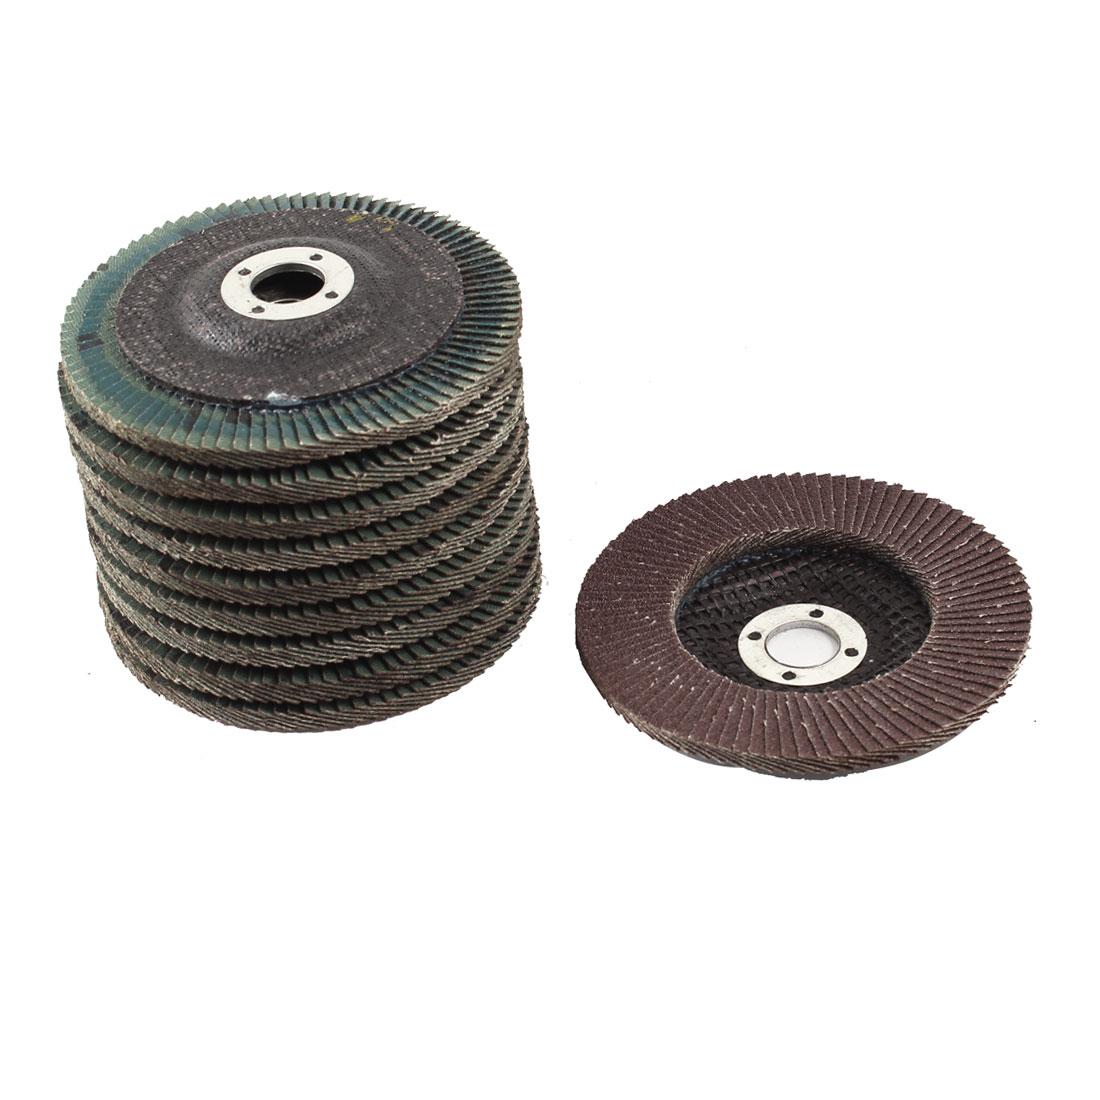 "Metal Polishing 4"" Dia 120# Flap Sanding Abrasive Wheels Discs 10Pcs"